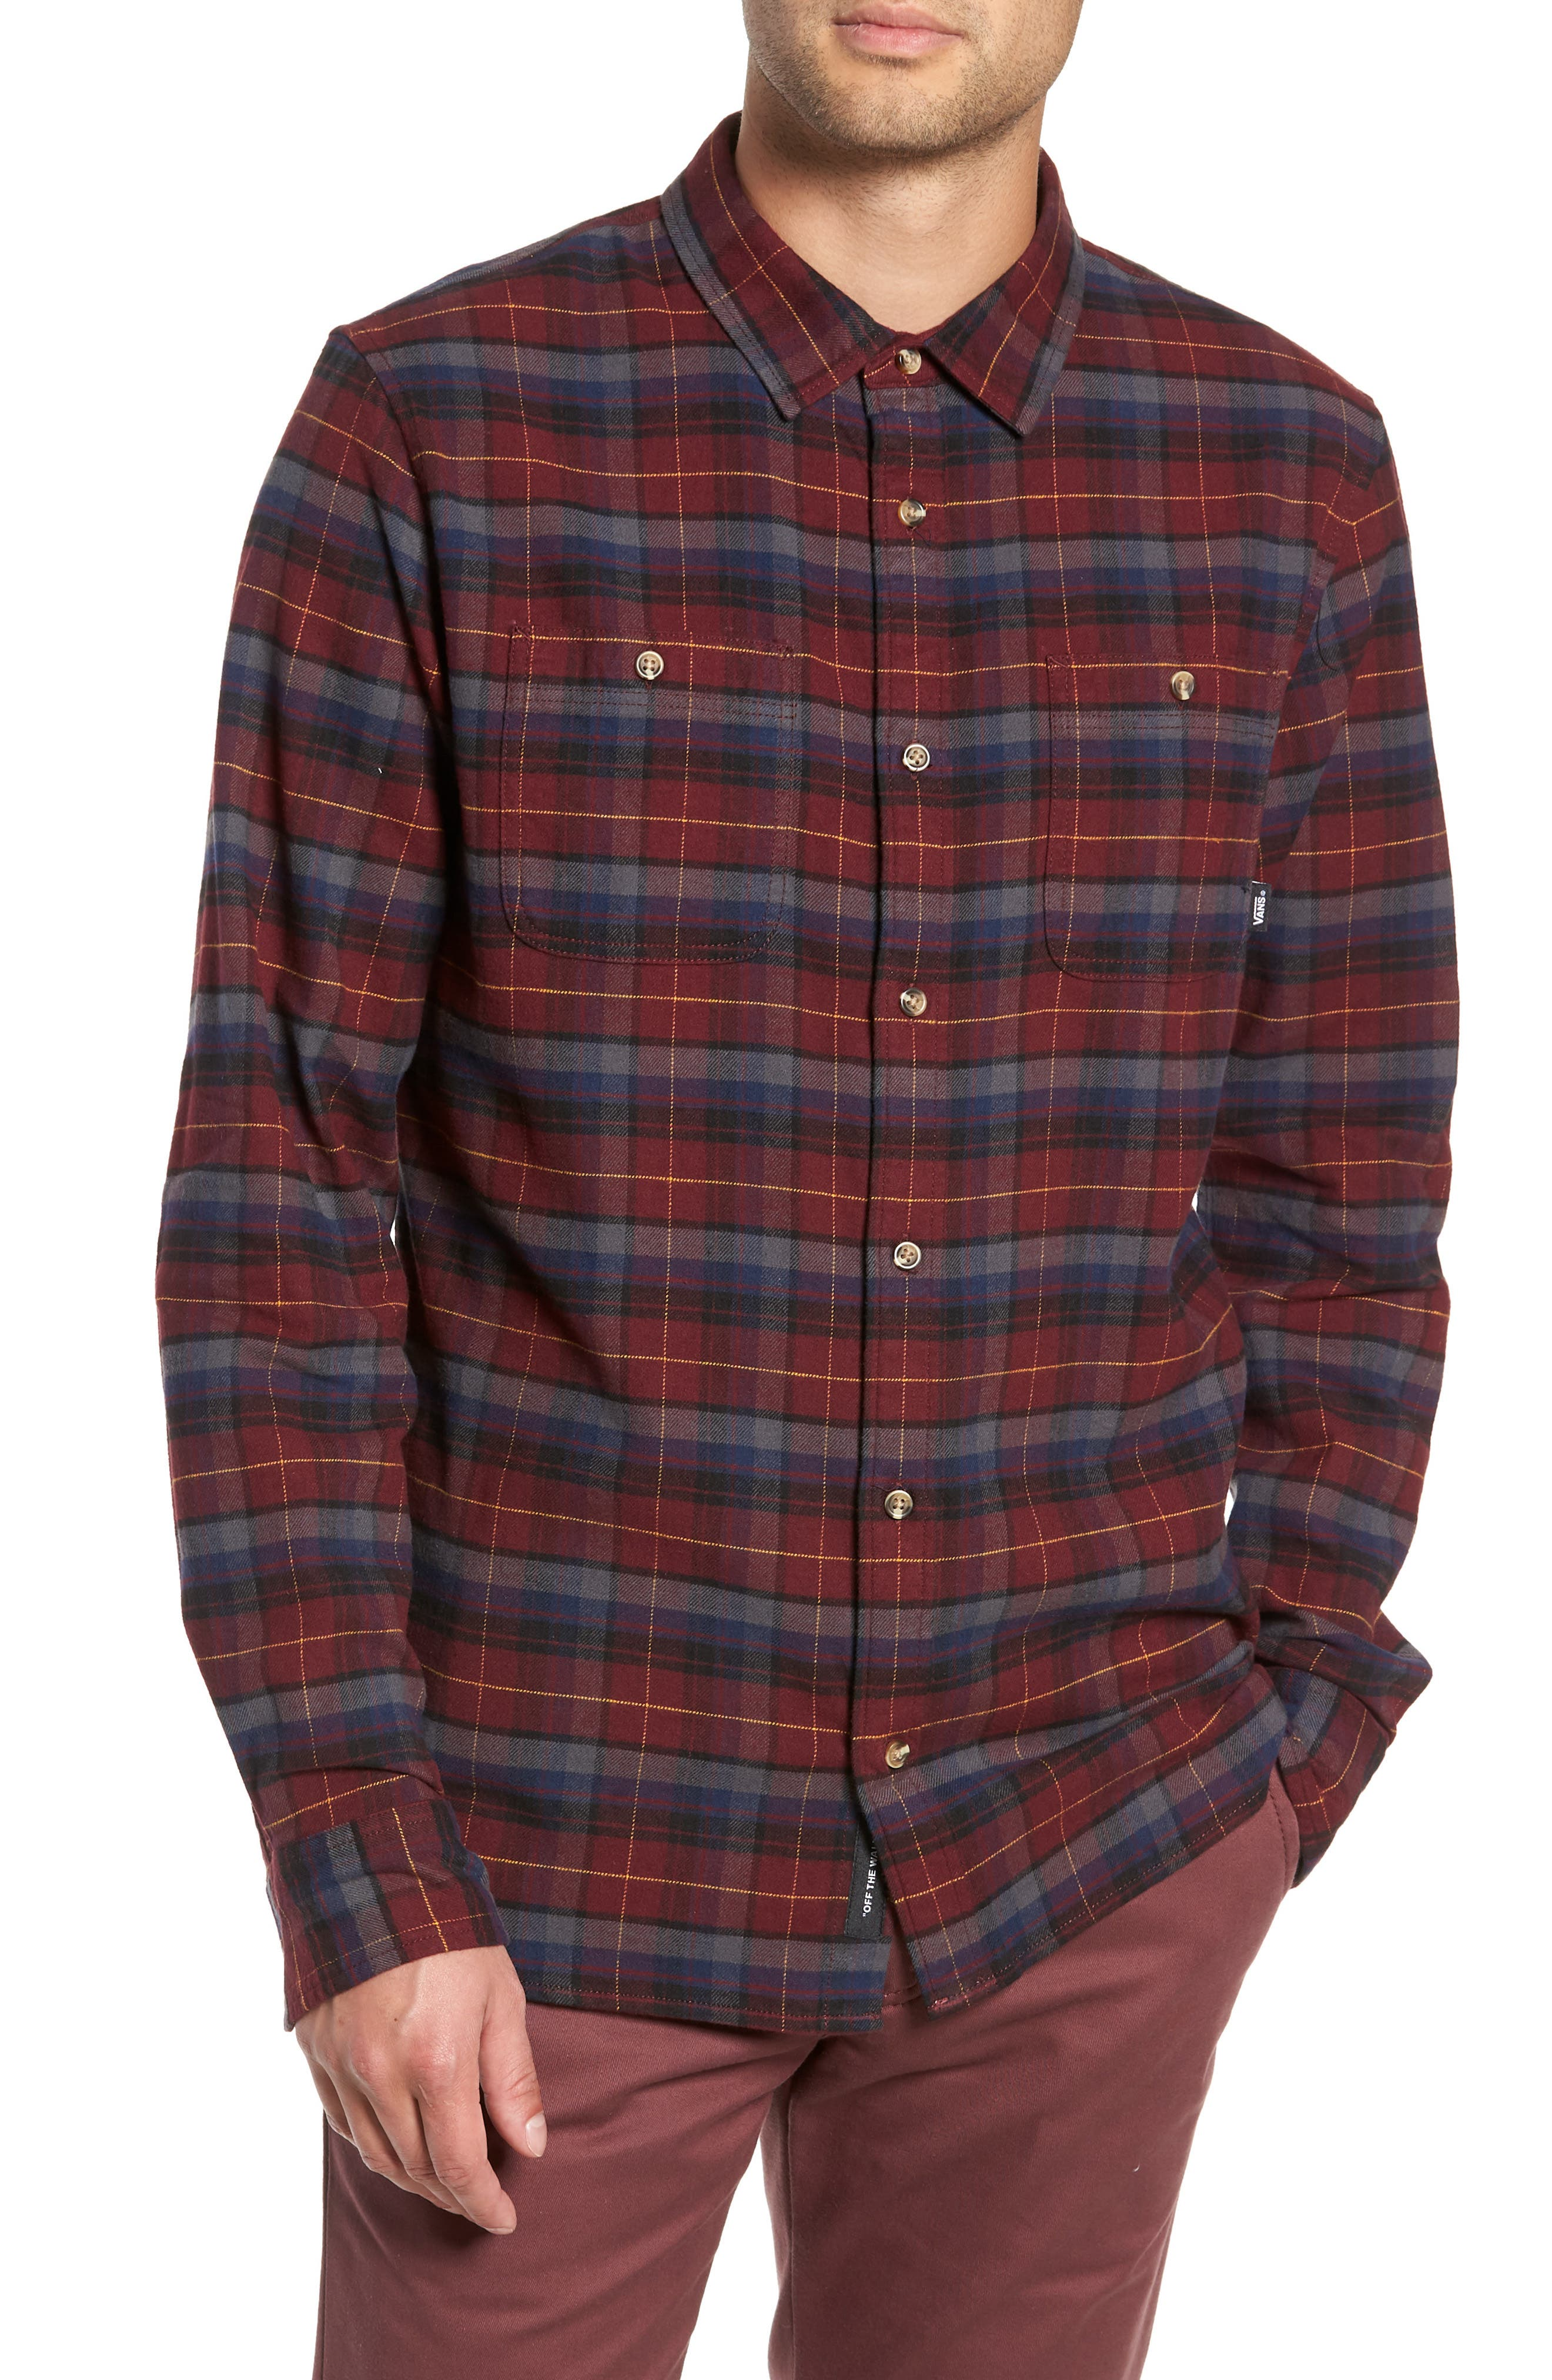 Vans Banfield Iii Plaid Flannel Shirt, Burgundy